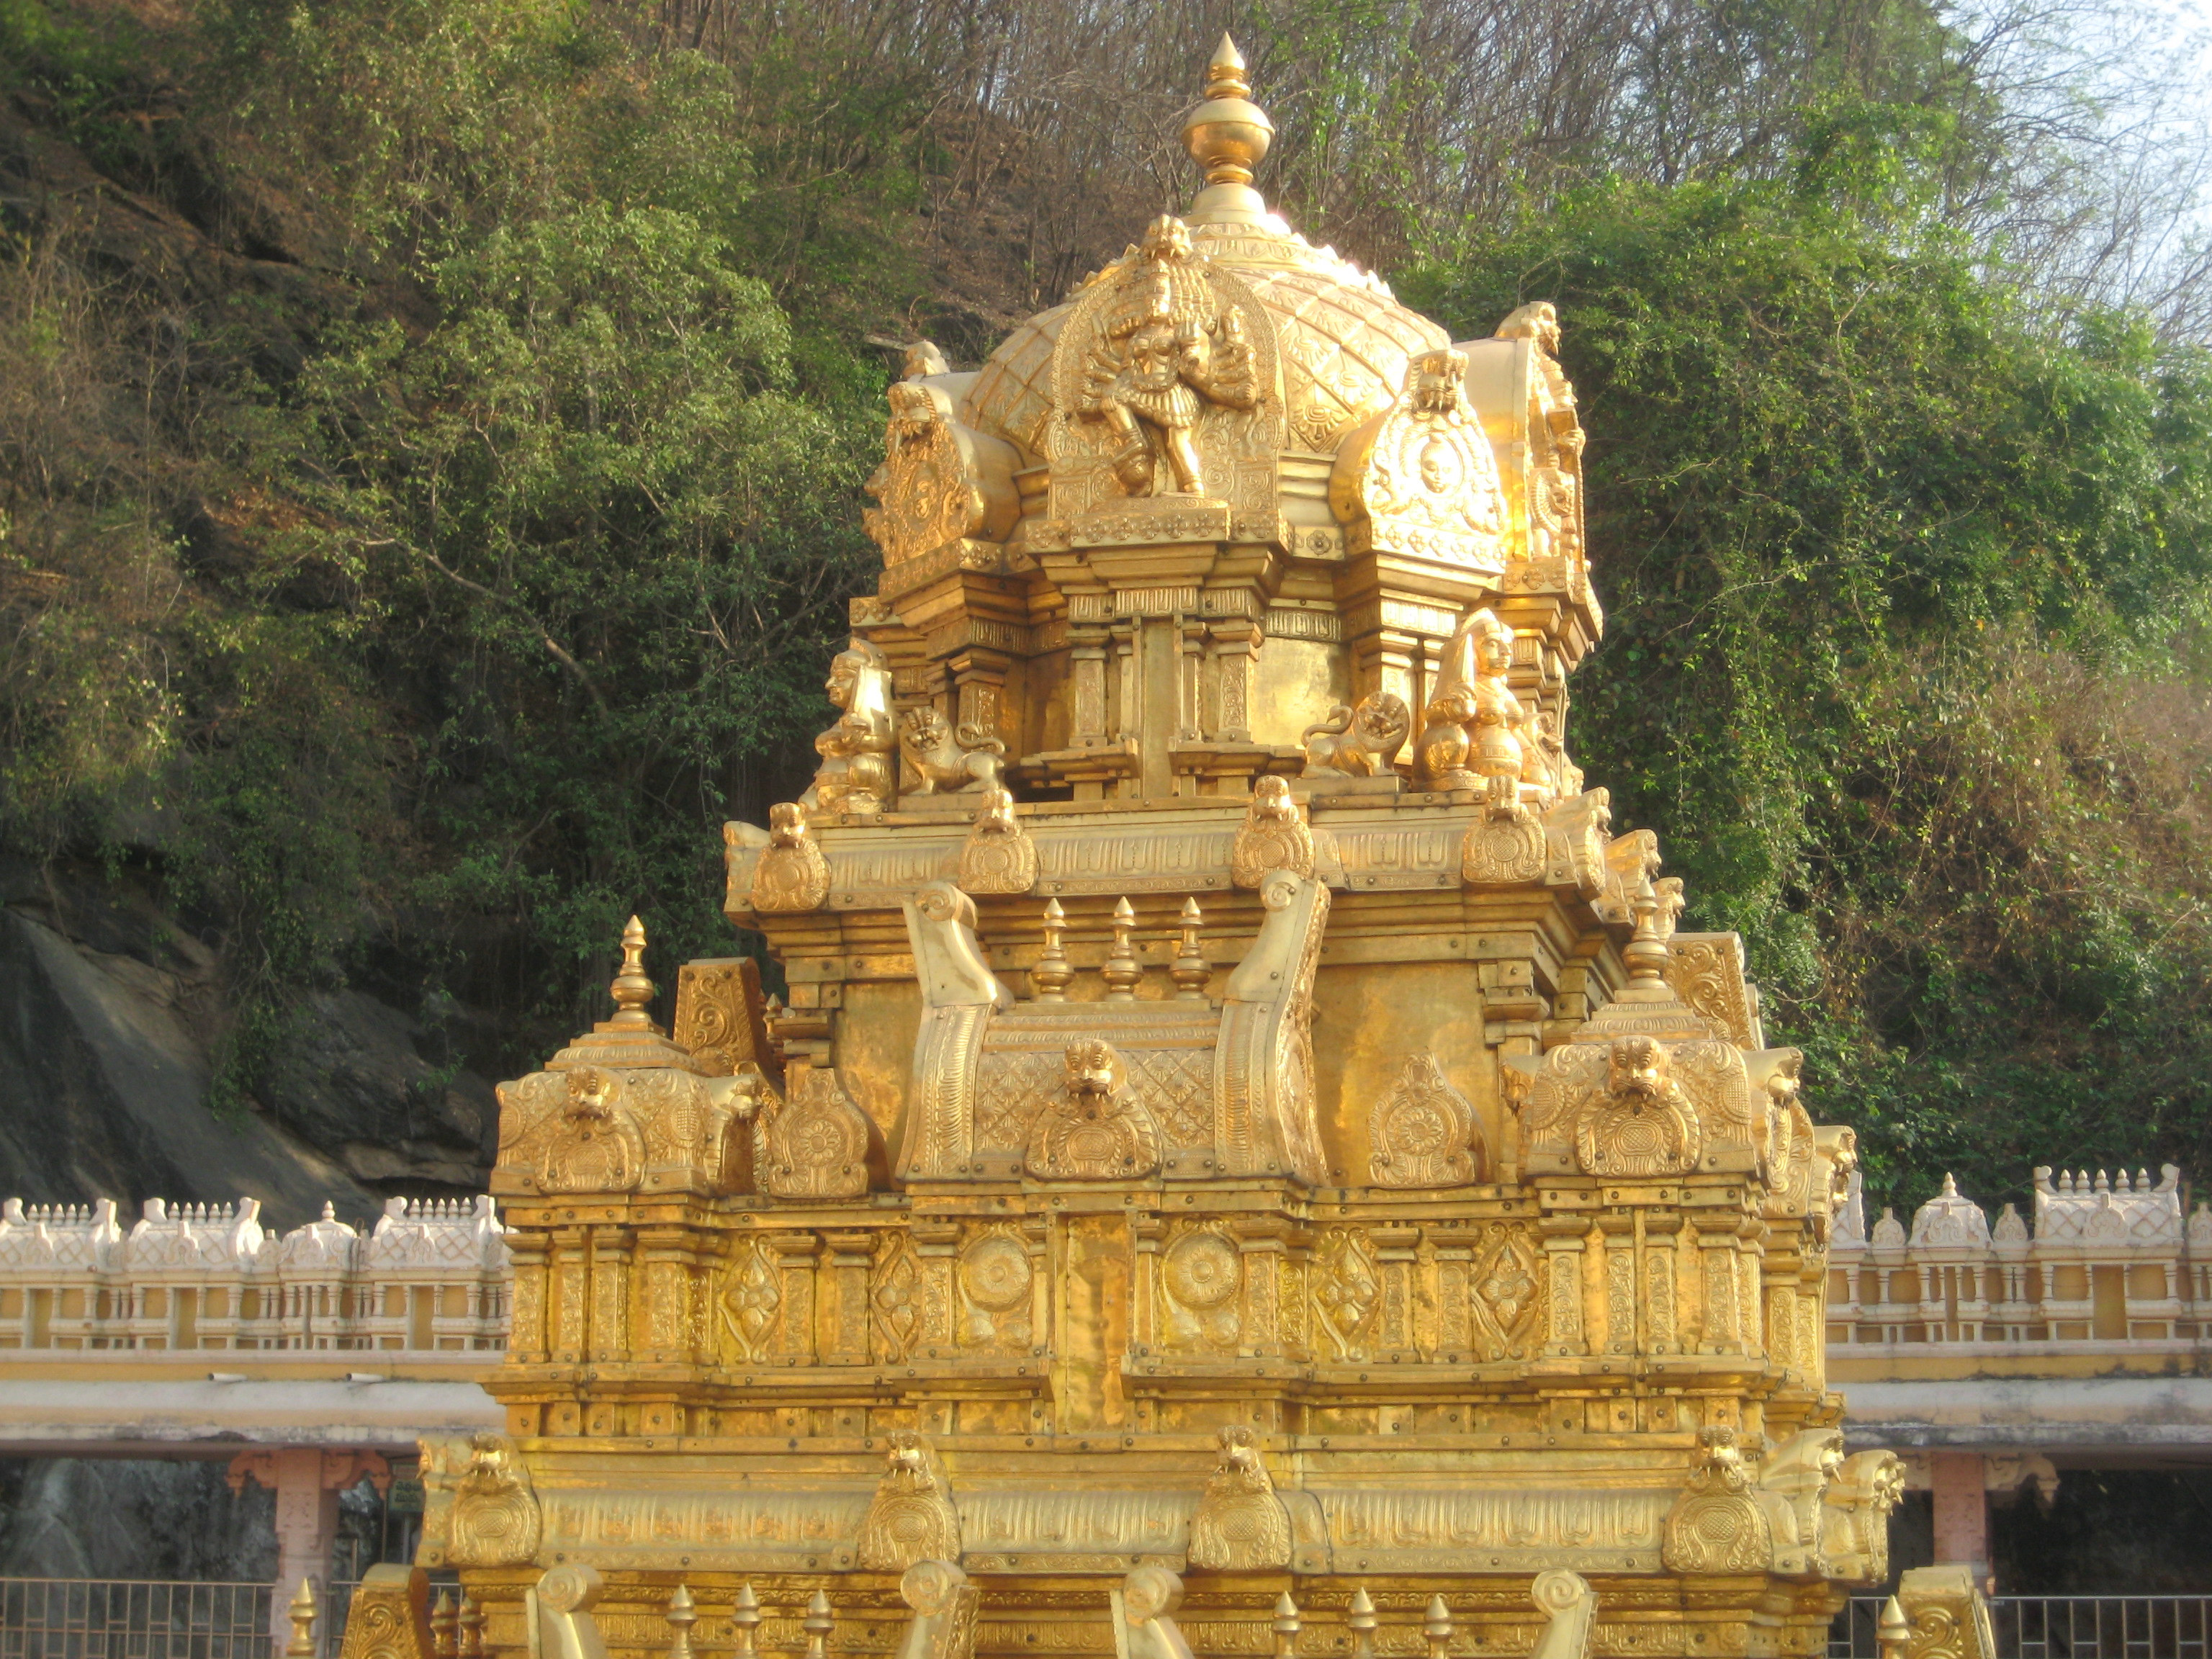 Vijayawada Durga devi main temple - VGTM city